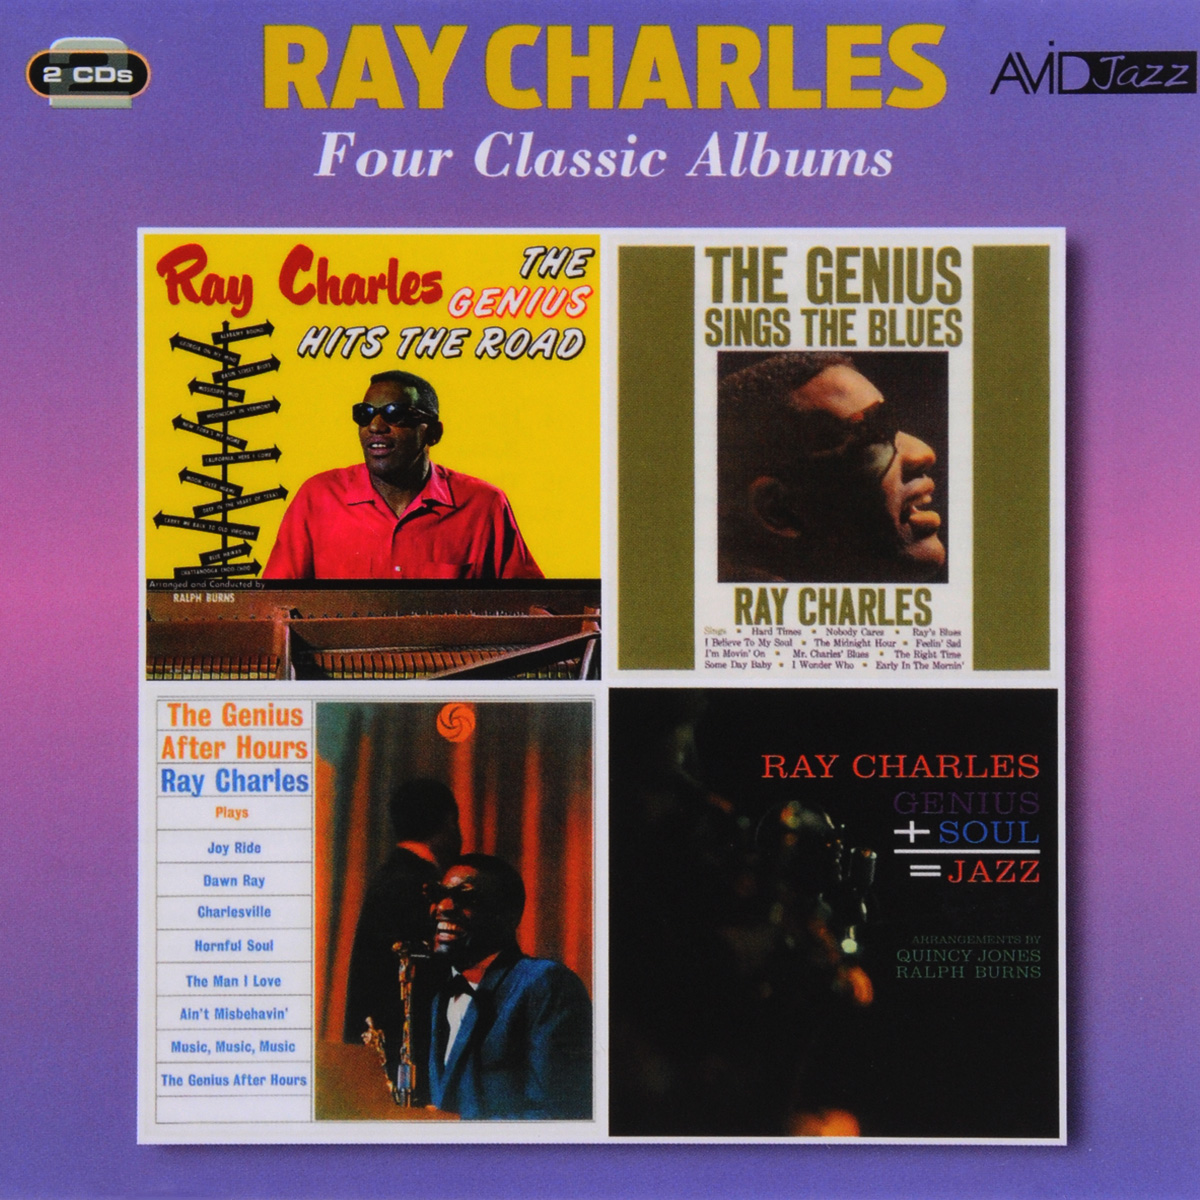 Рэй Чарльз Ray Charles. Four Classic Albums (2 CD) рэй чарльз ray charles original album series 5 cd